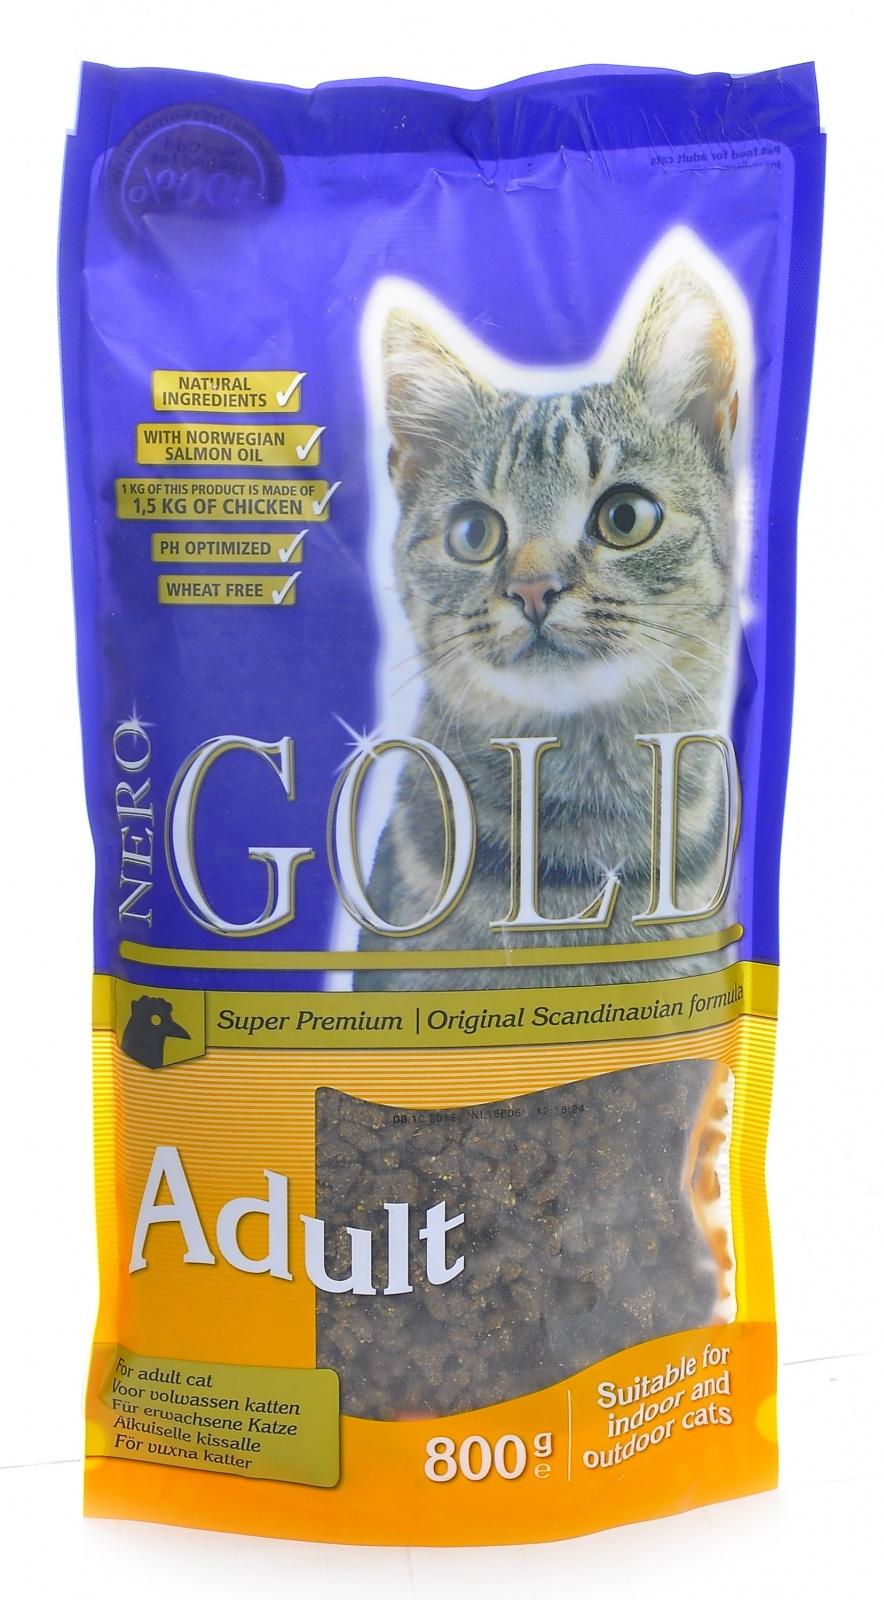 Неро Голд Корм сухой Cat Adult Chicken 32/18 для кошек, Курица, в ассортименте, Nero Gold